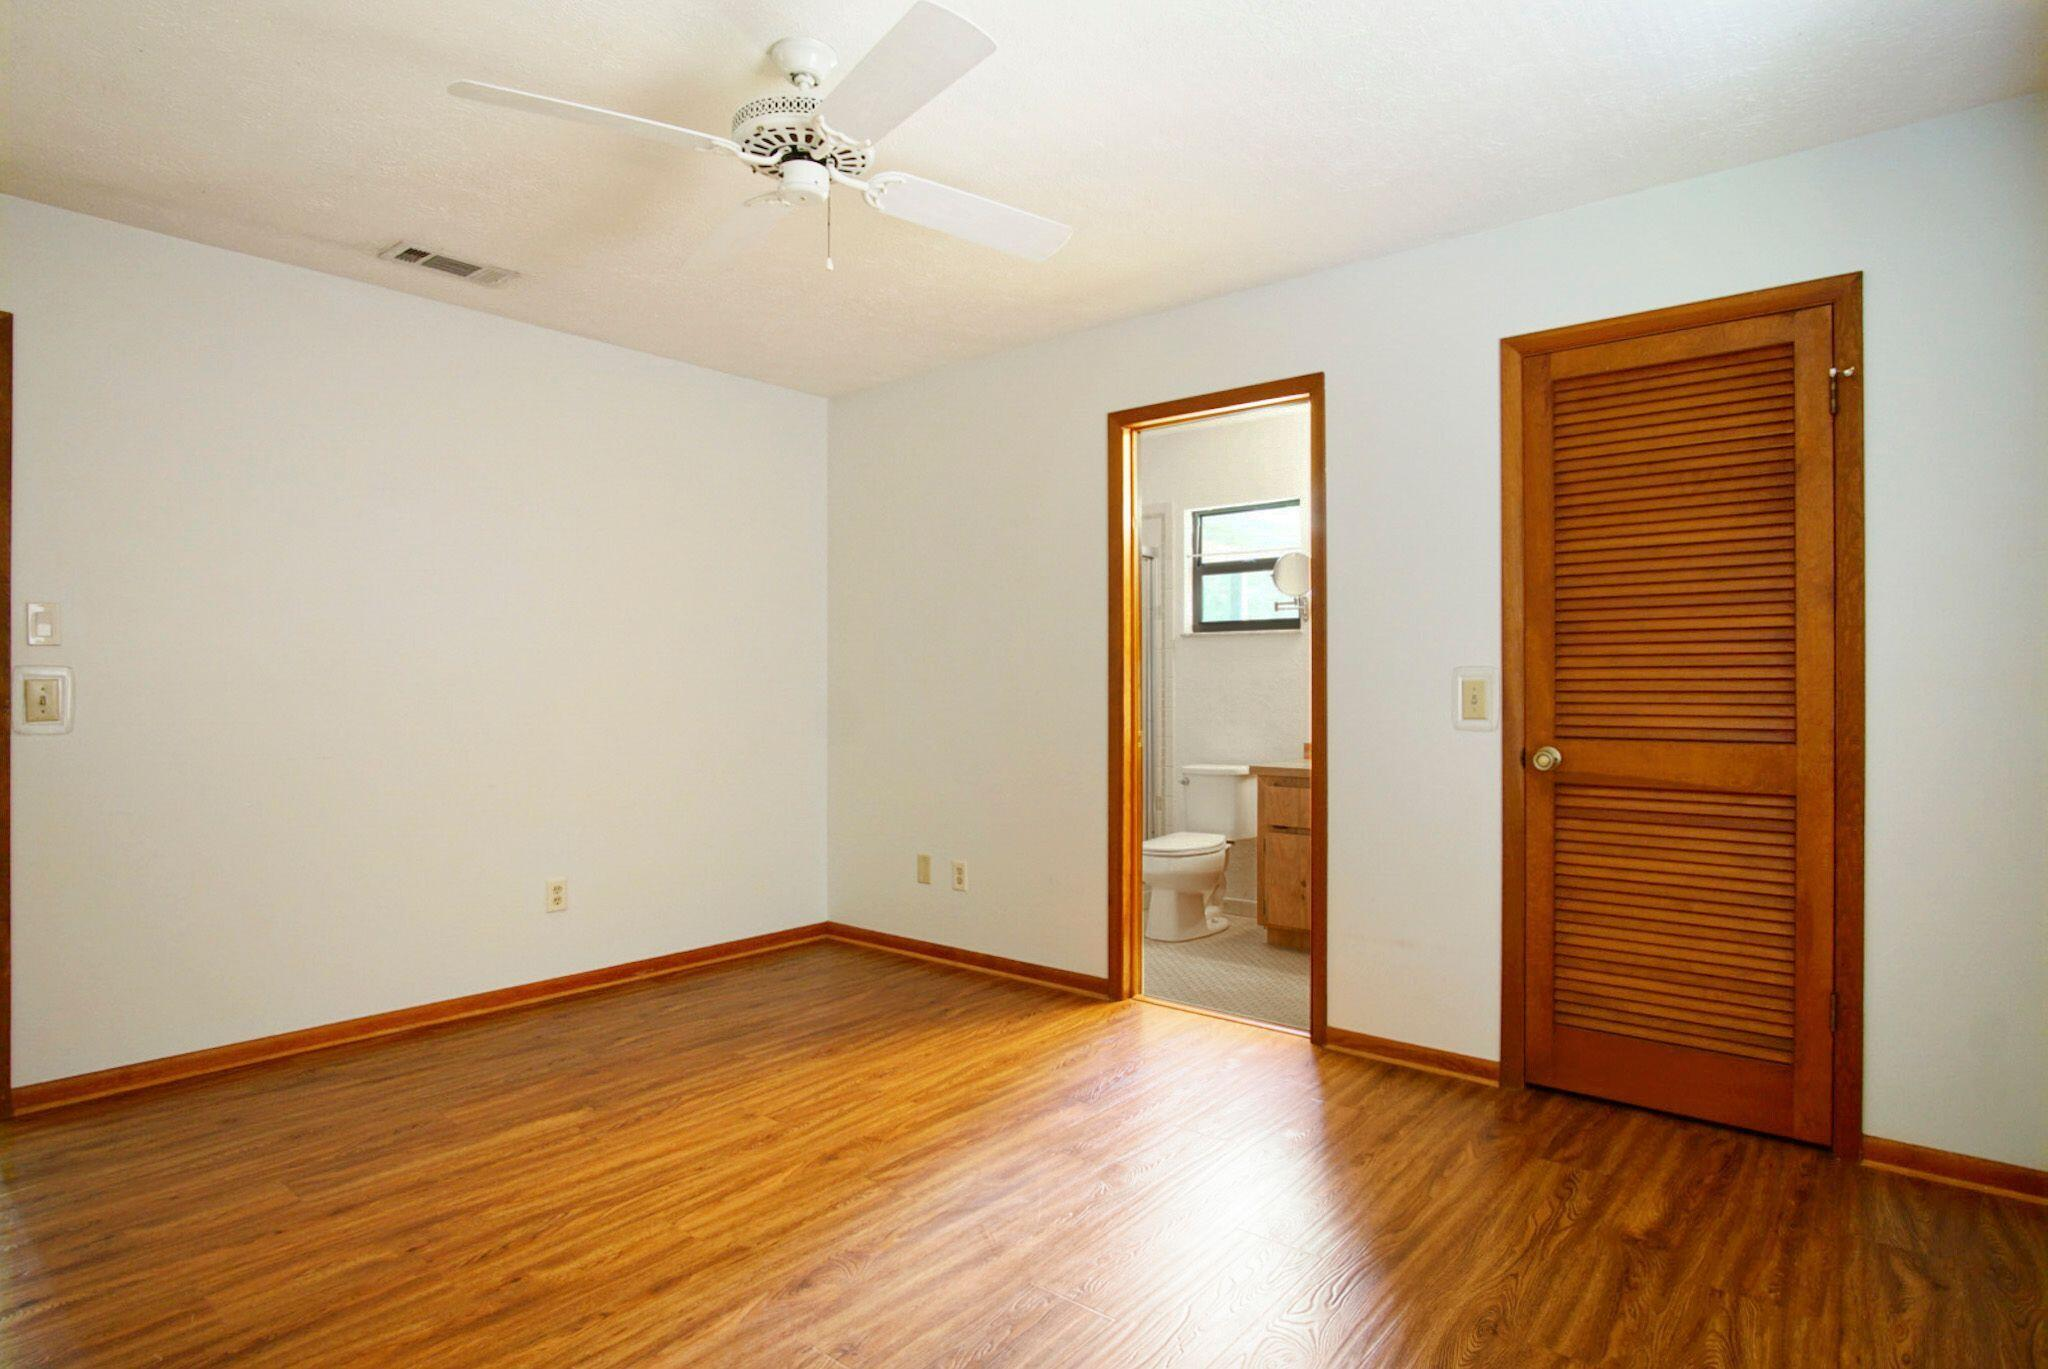 Irving Master bedroom.bath